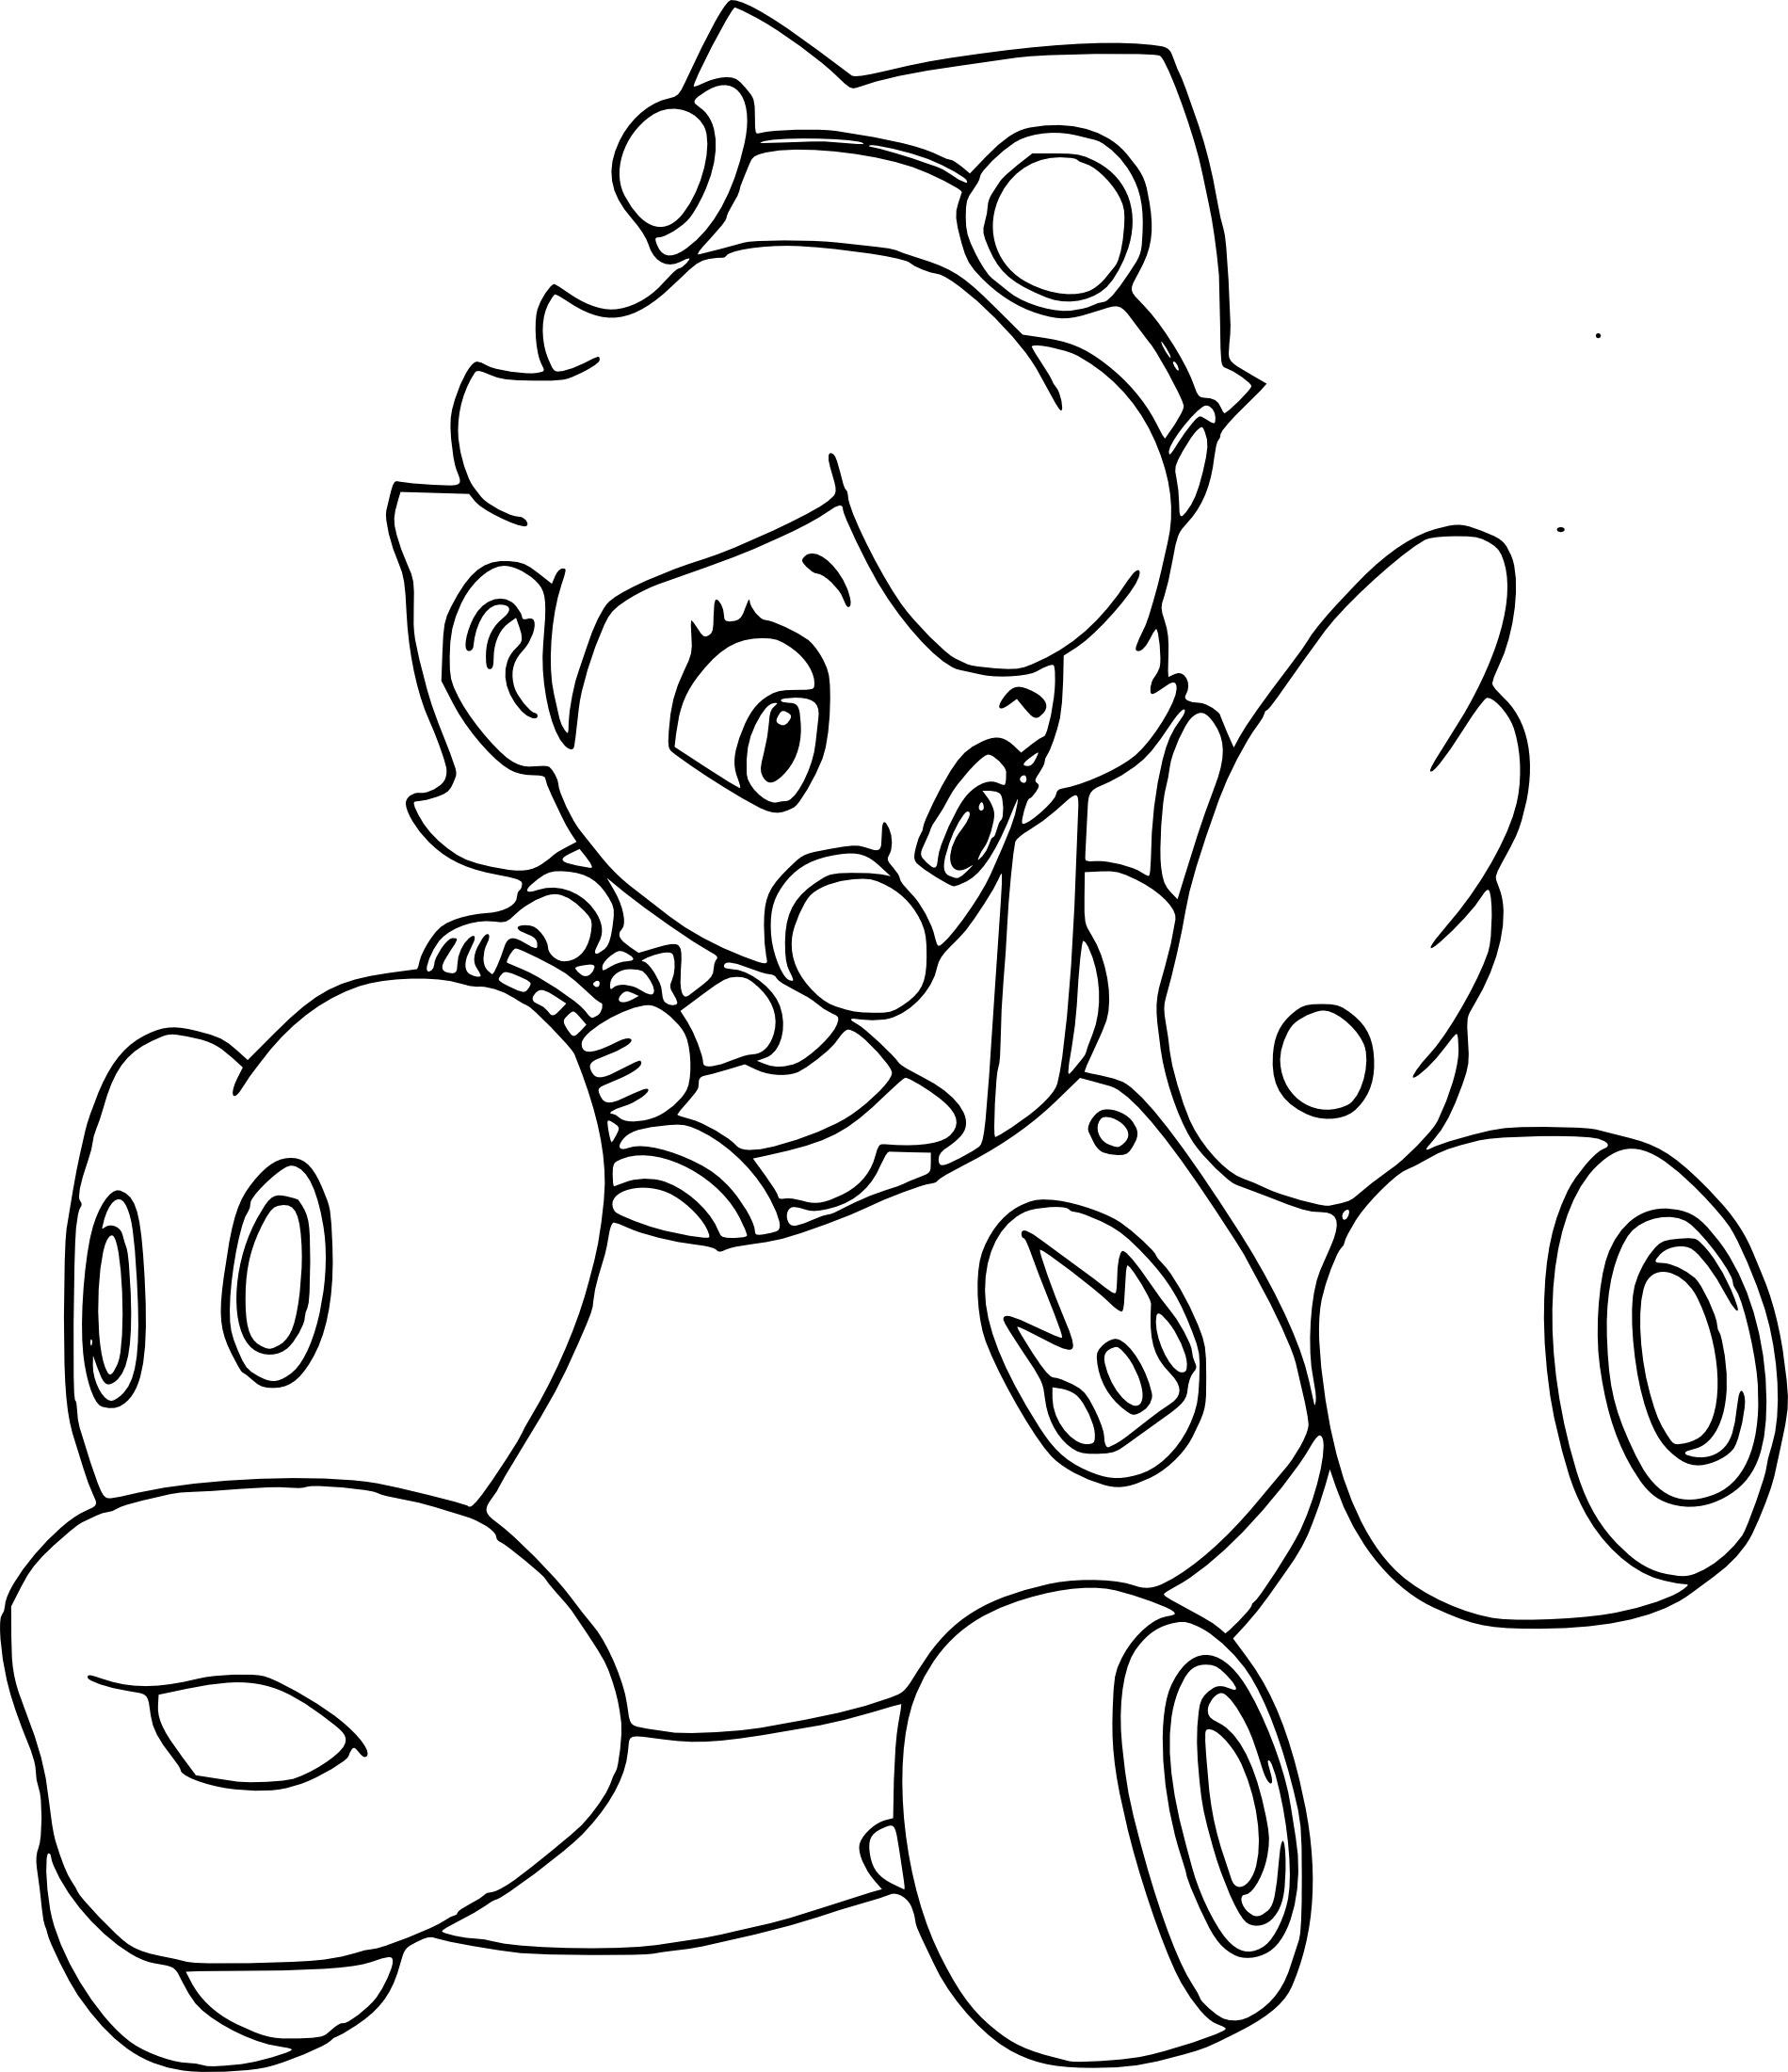 Coloriage Peach Mario Kart à Imprimer